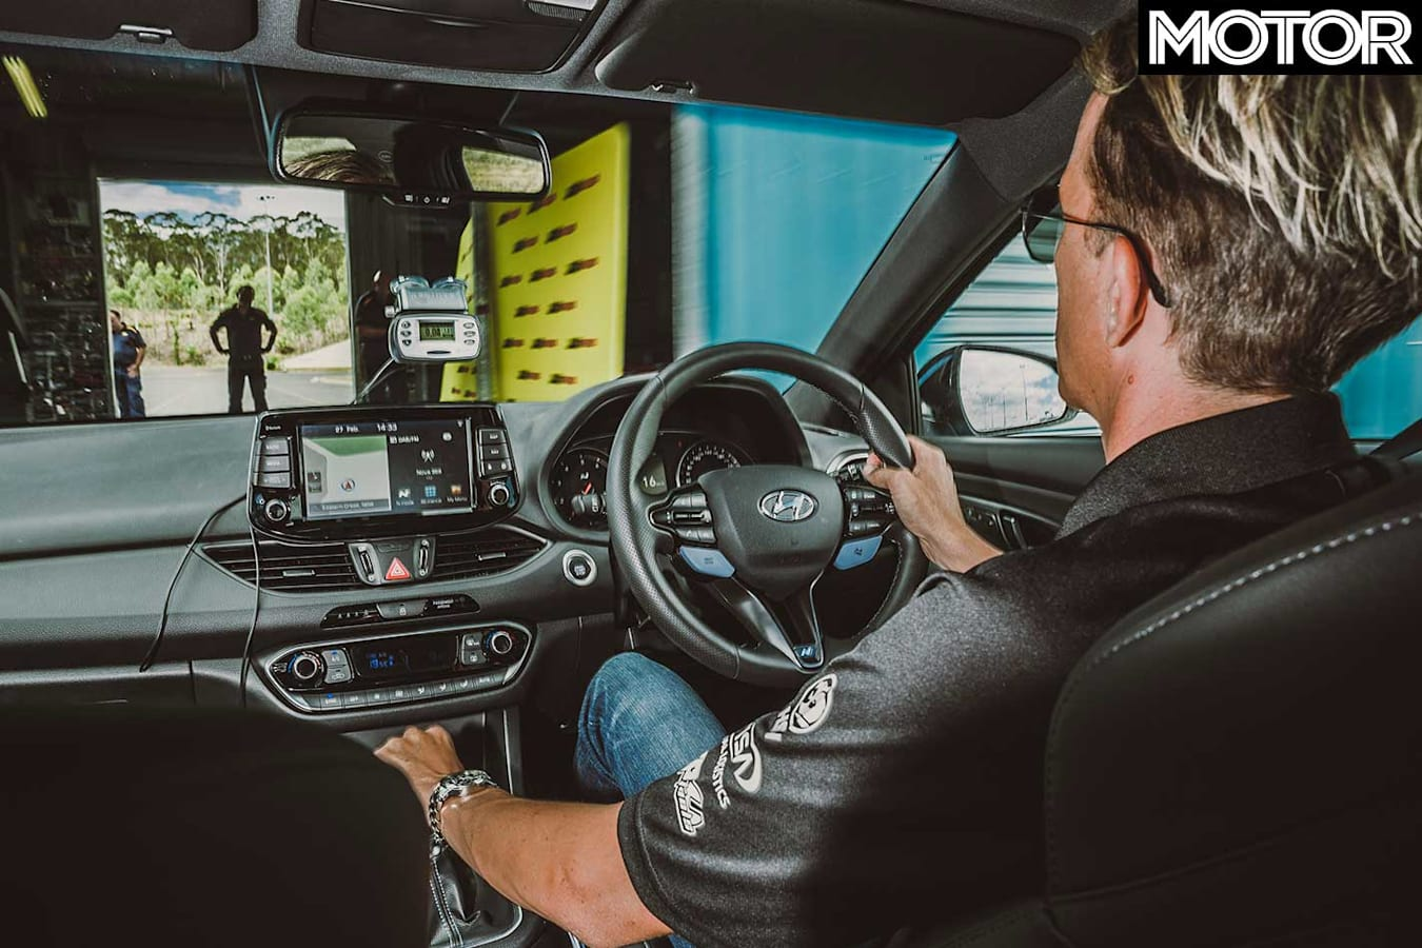 MOTOR Tyre Test 2018 Dry Motorkhana Pits Tyre Change Jpg